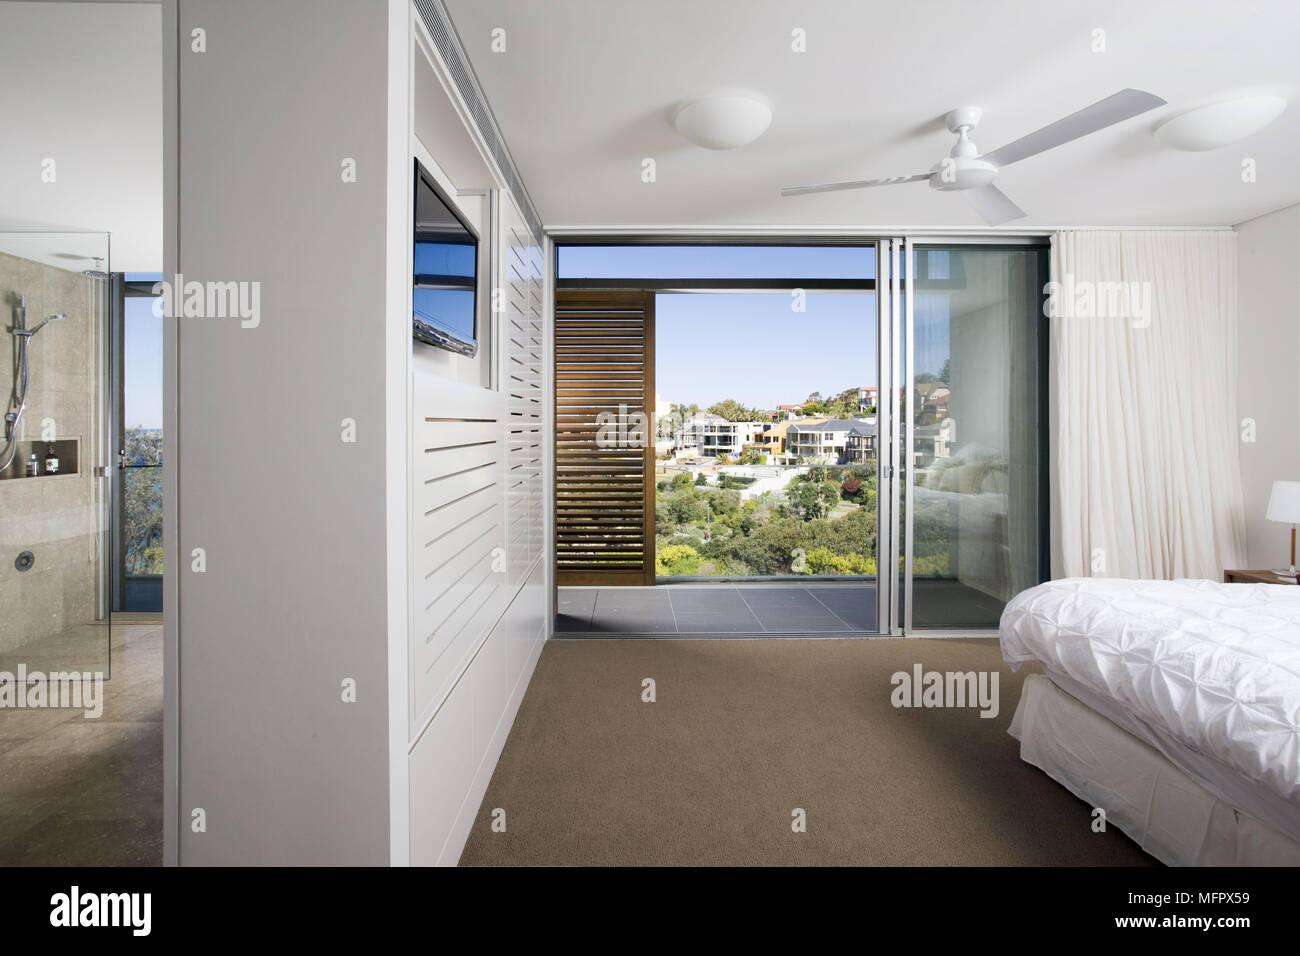 3c0459aca498 Modern bedroom with sliding doors to balcony terrace Stock Photo ...